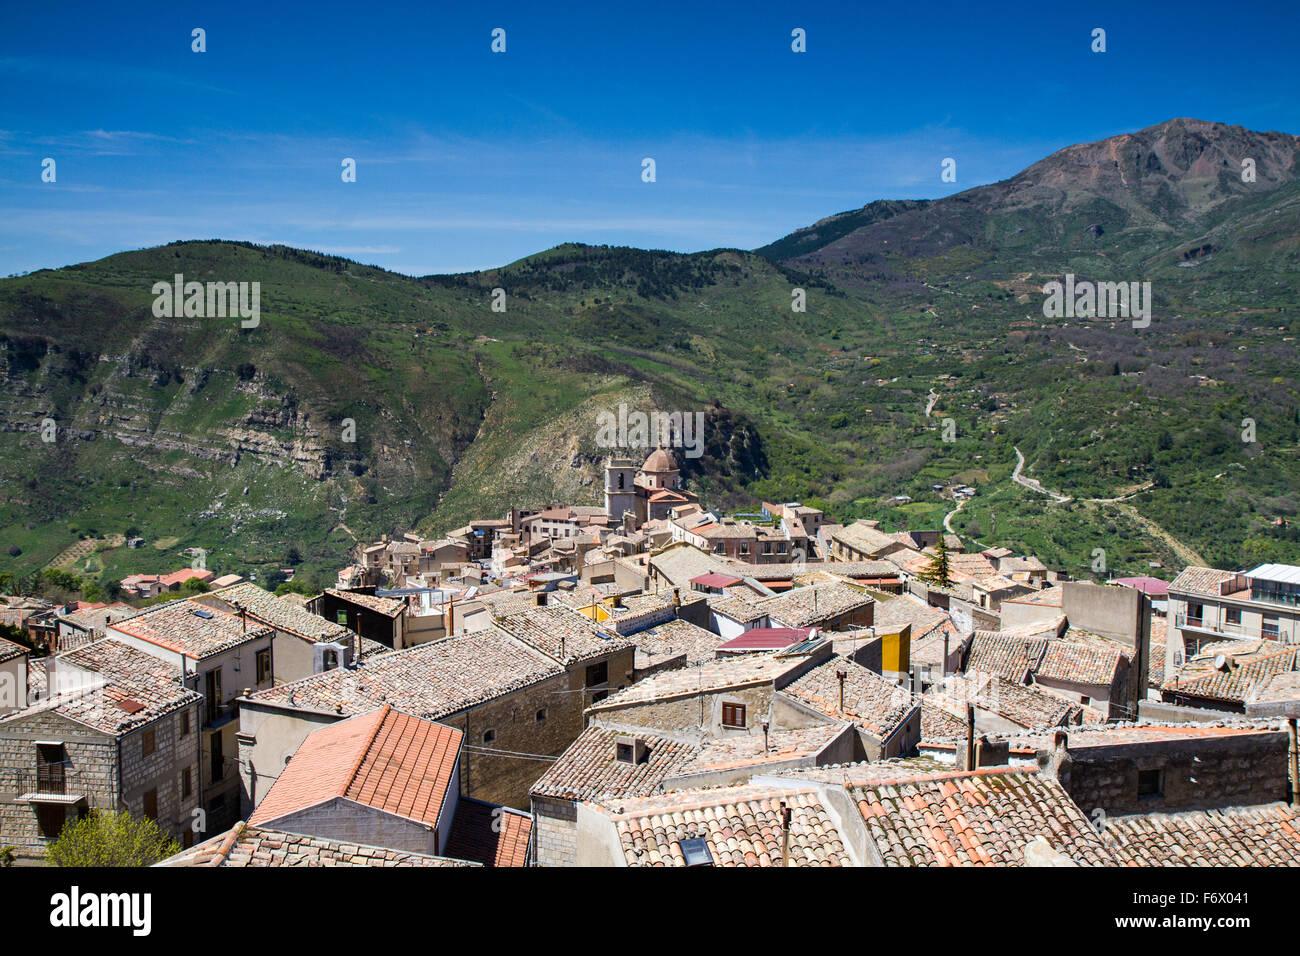 Panorama of Petralia Sottana, Sicily, Italy - Stock Image